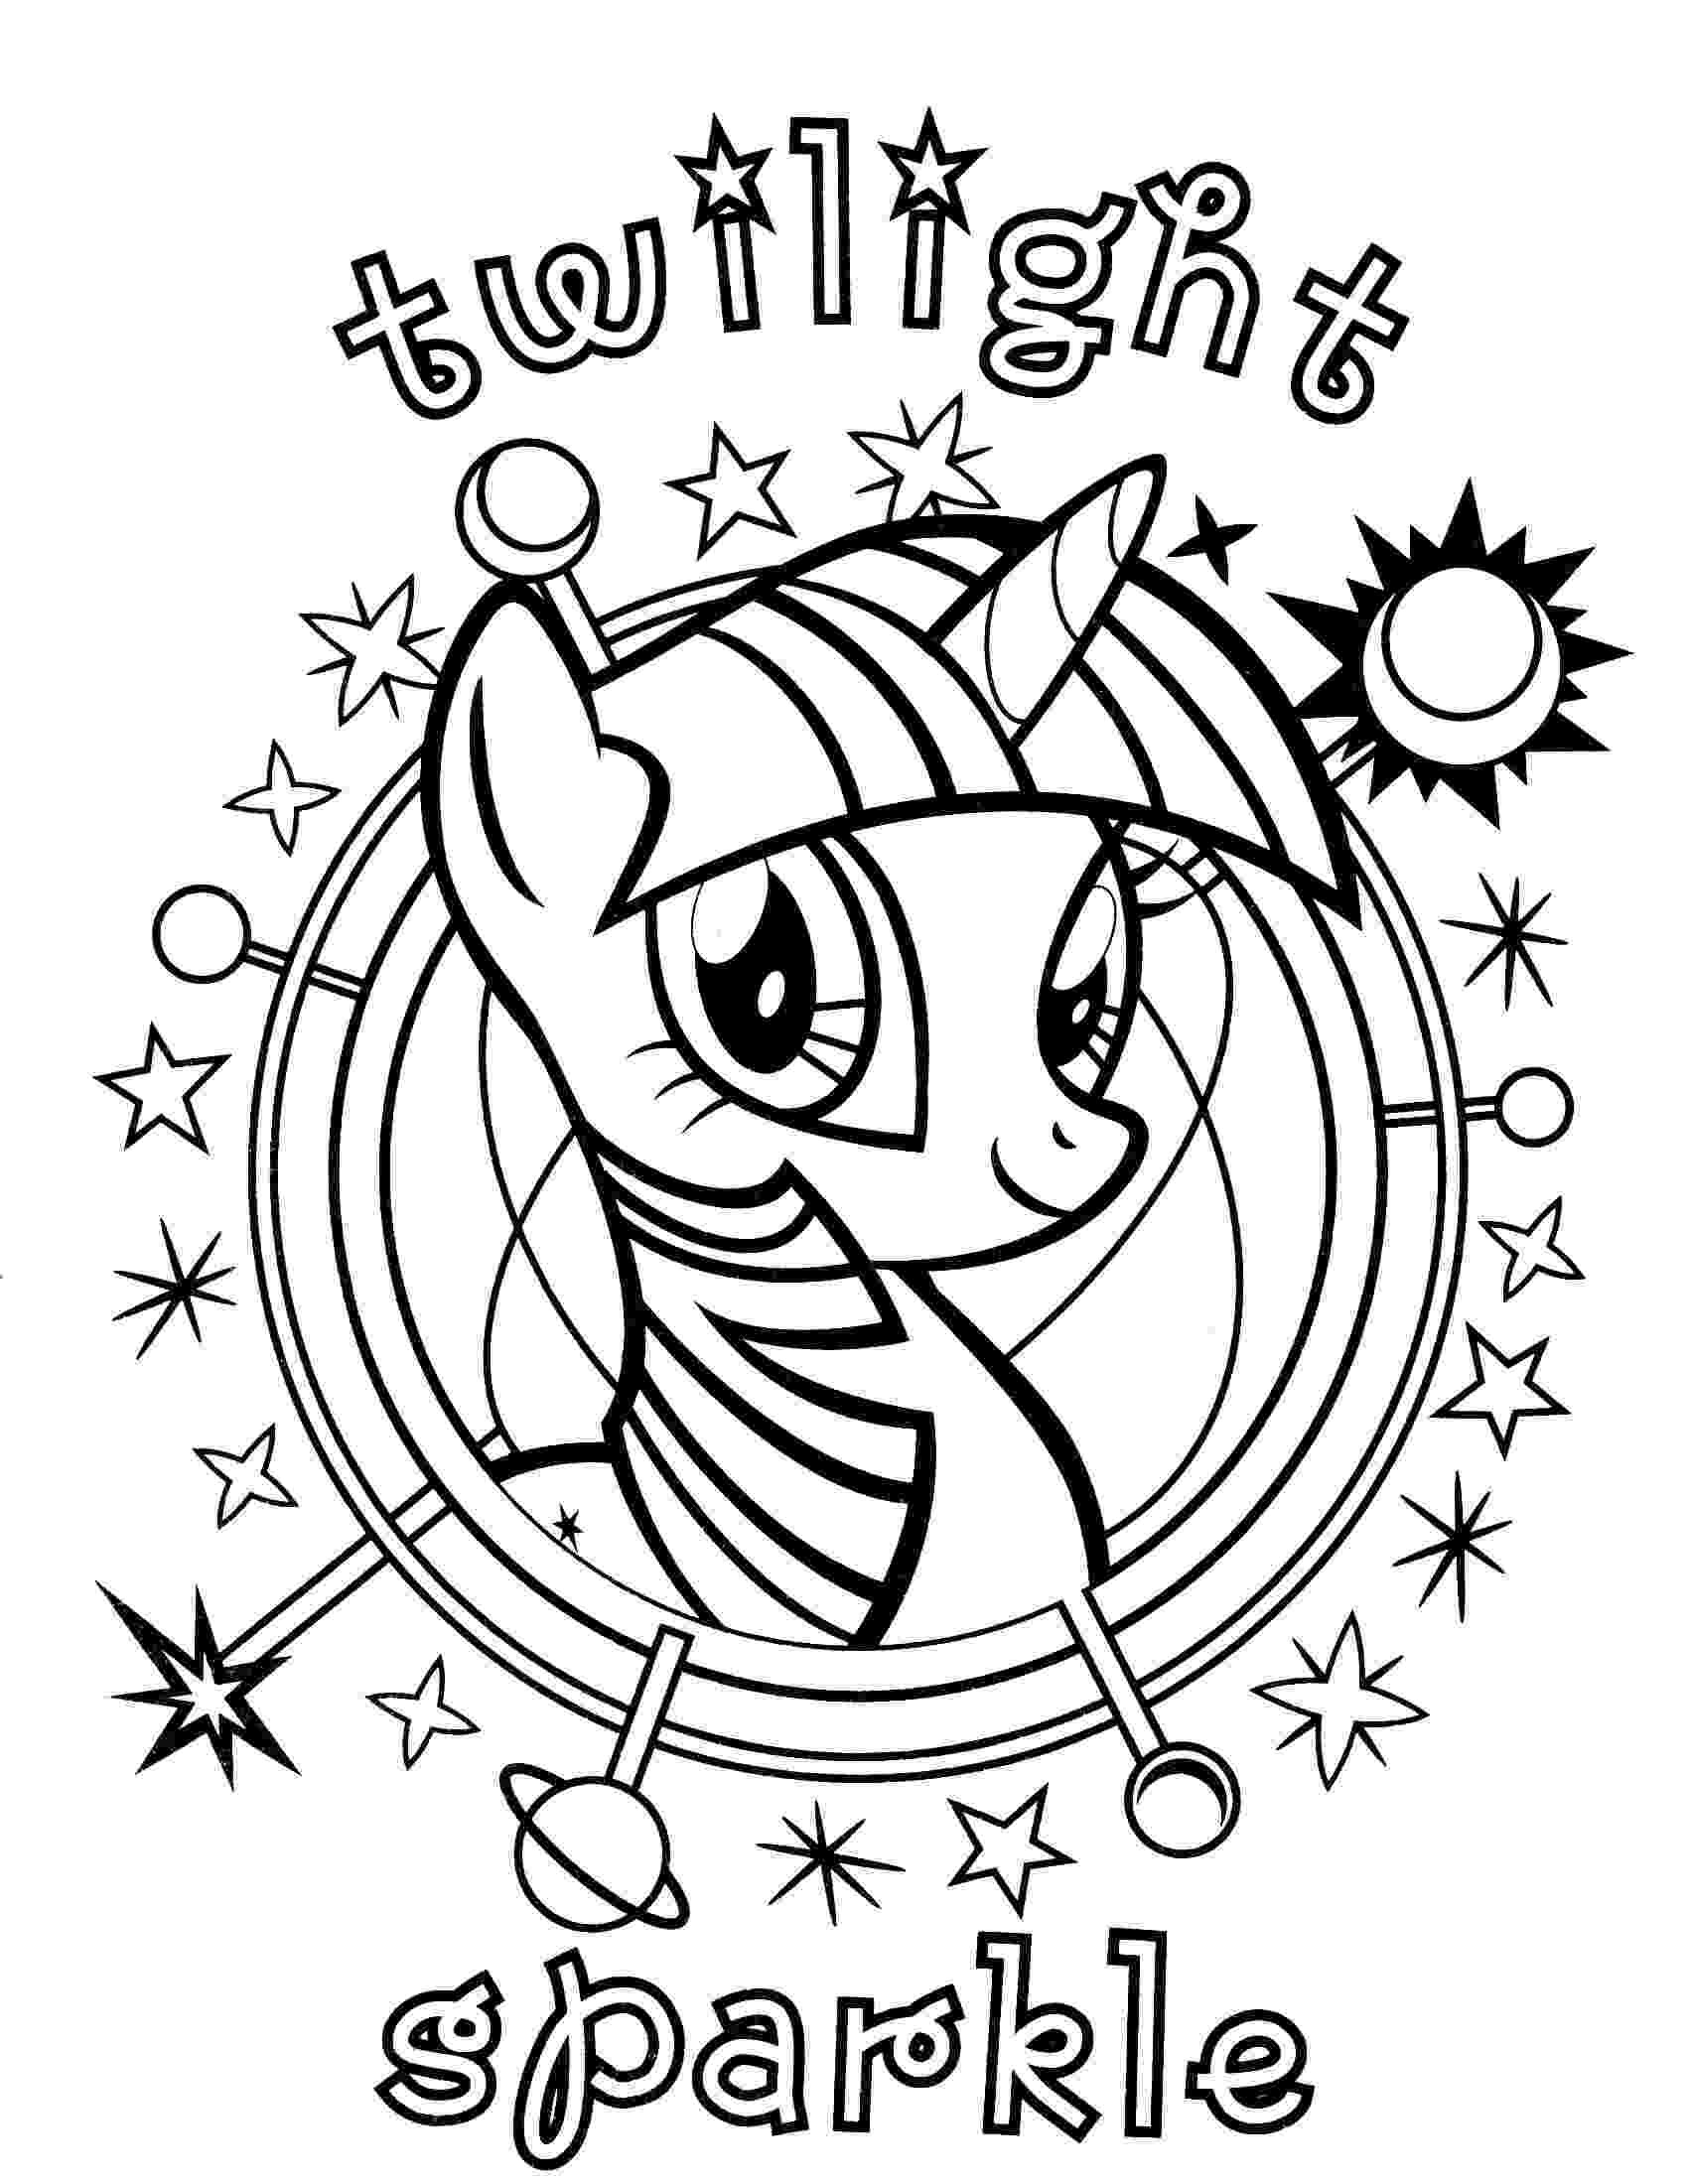 pony para colorear e imprimir dibujoparacoloreardescootaloodemylittlepony06gif imprimir e pony para colorear